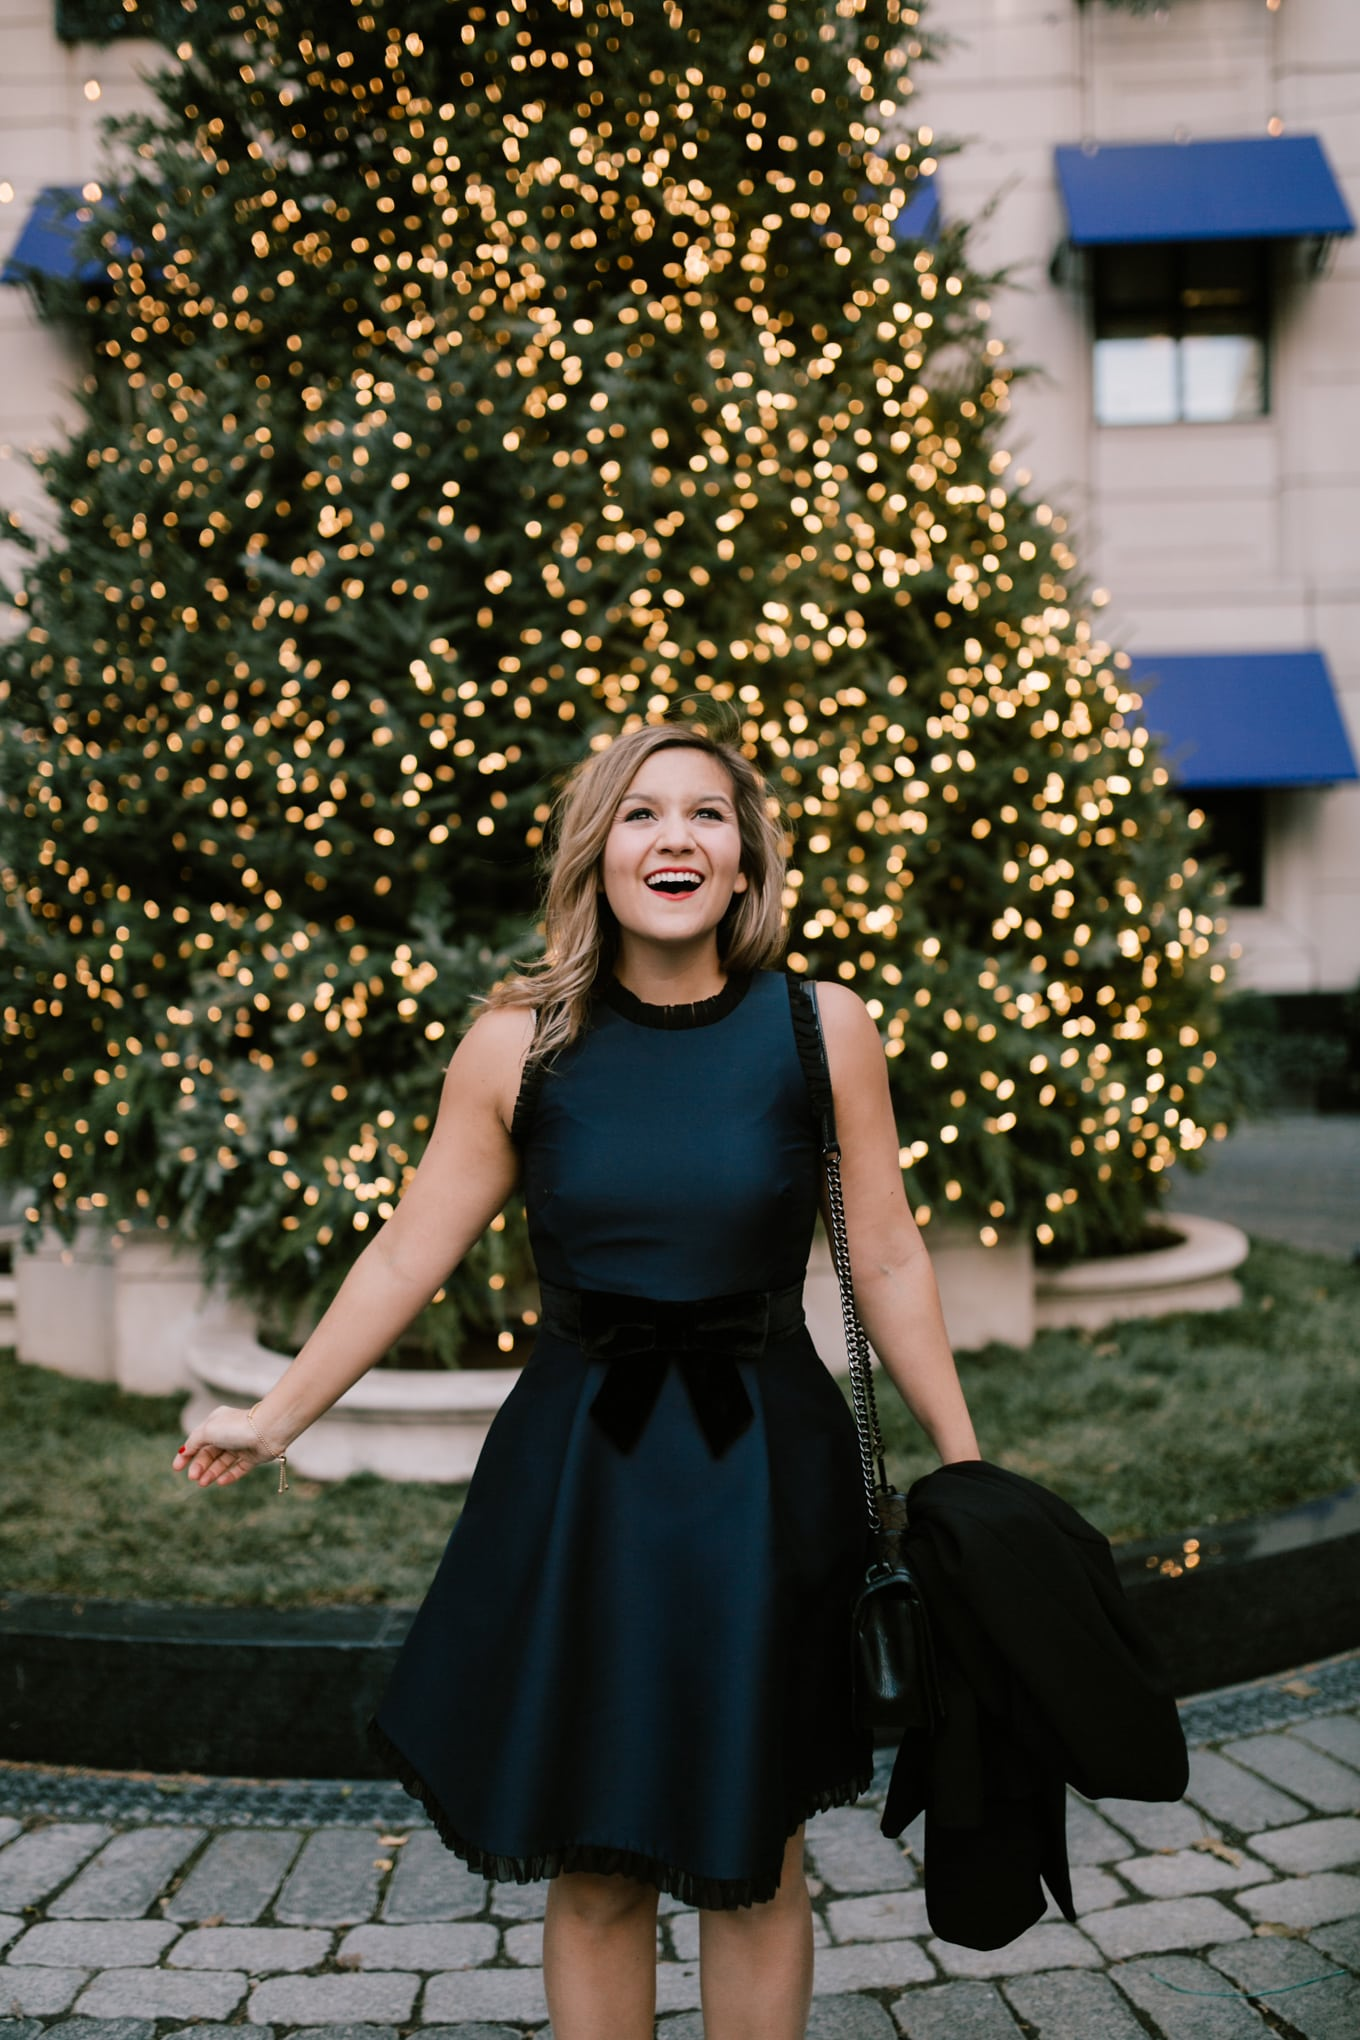 The perfect Christmas dress: Kate Spade velvet bow dress